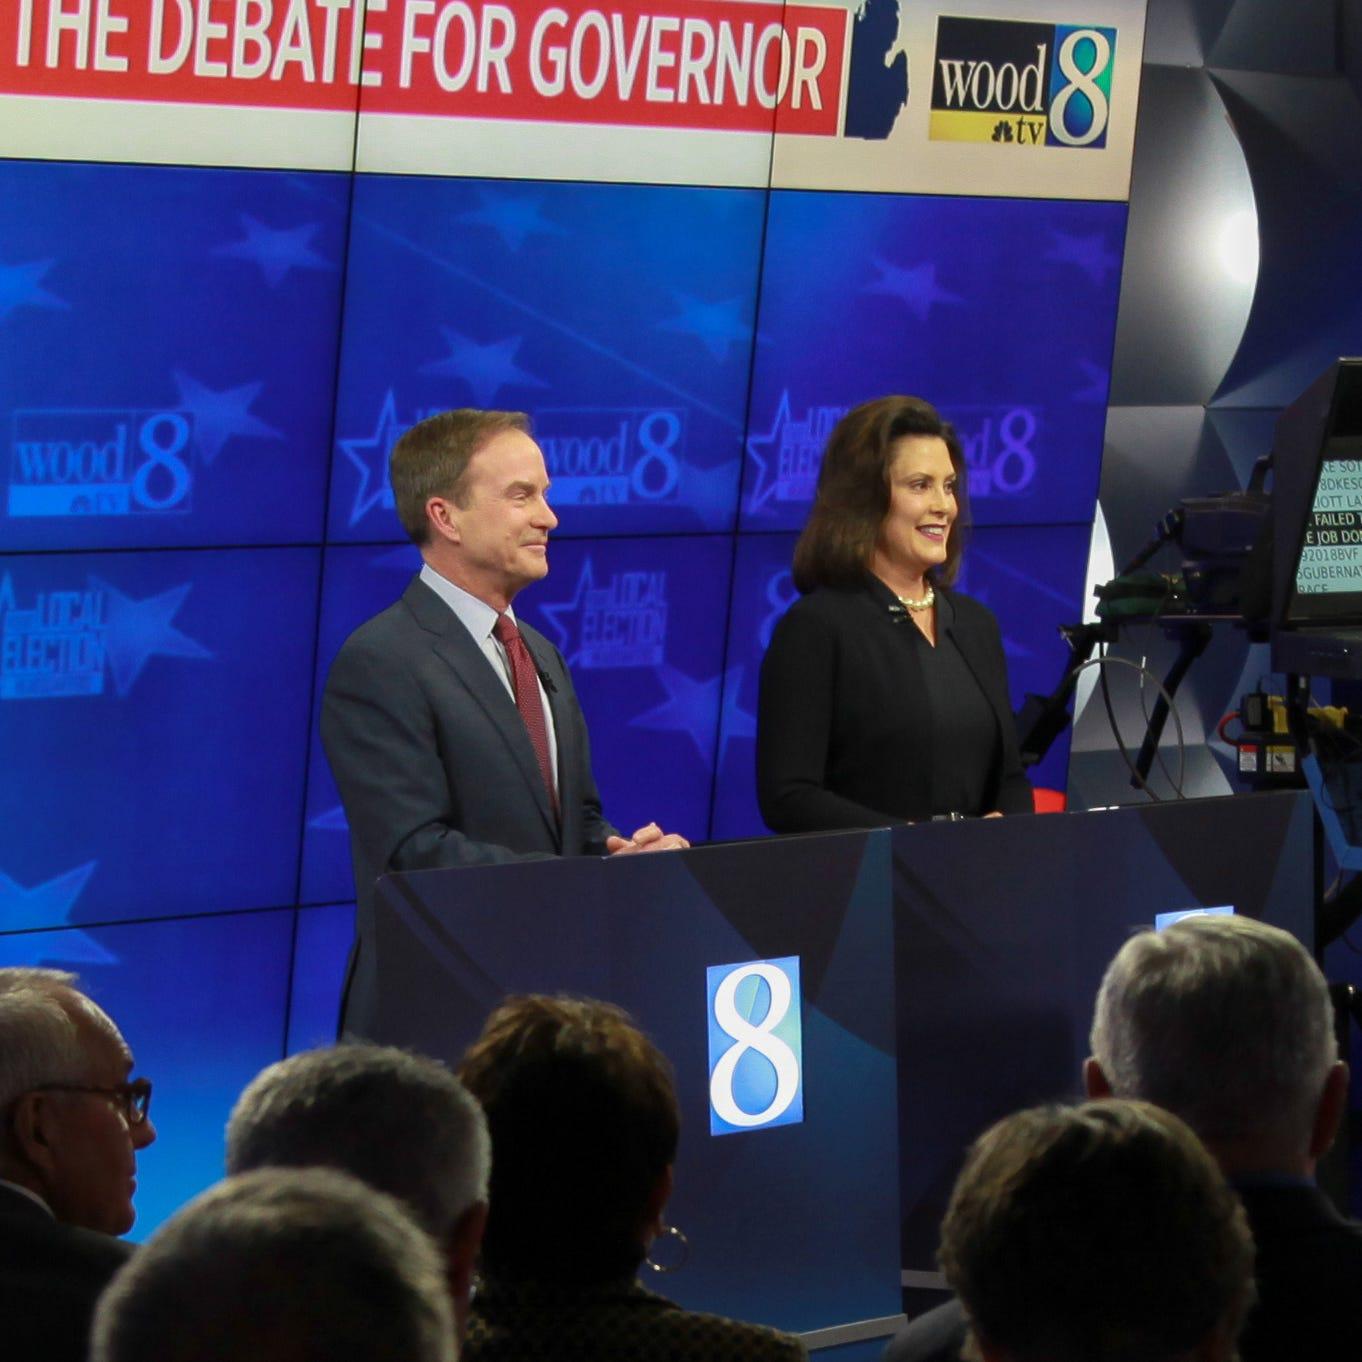 Finley: Gov debate? Next time I'll choose Pat and Vanna